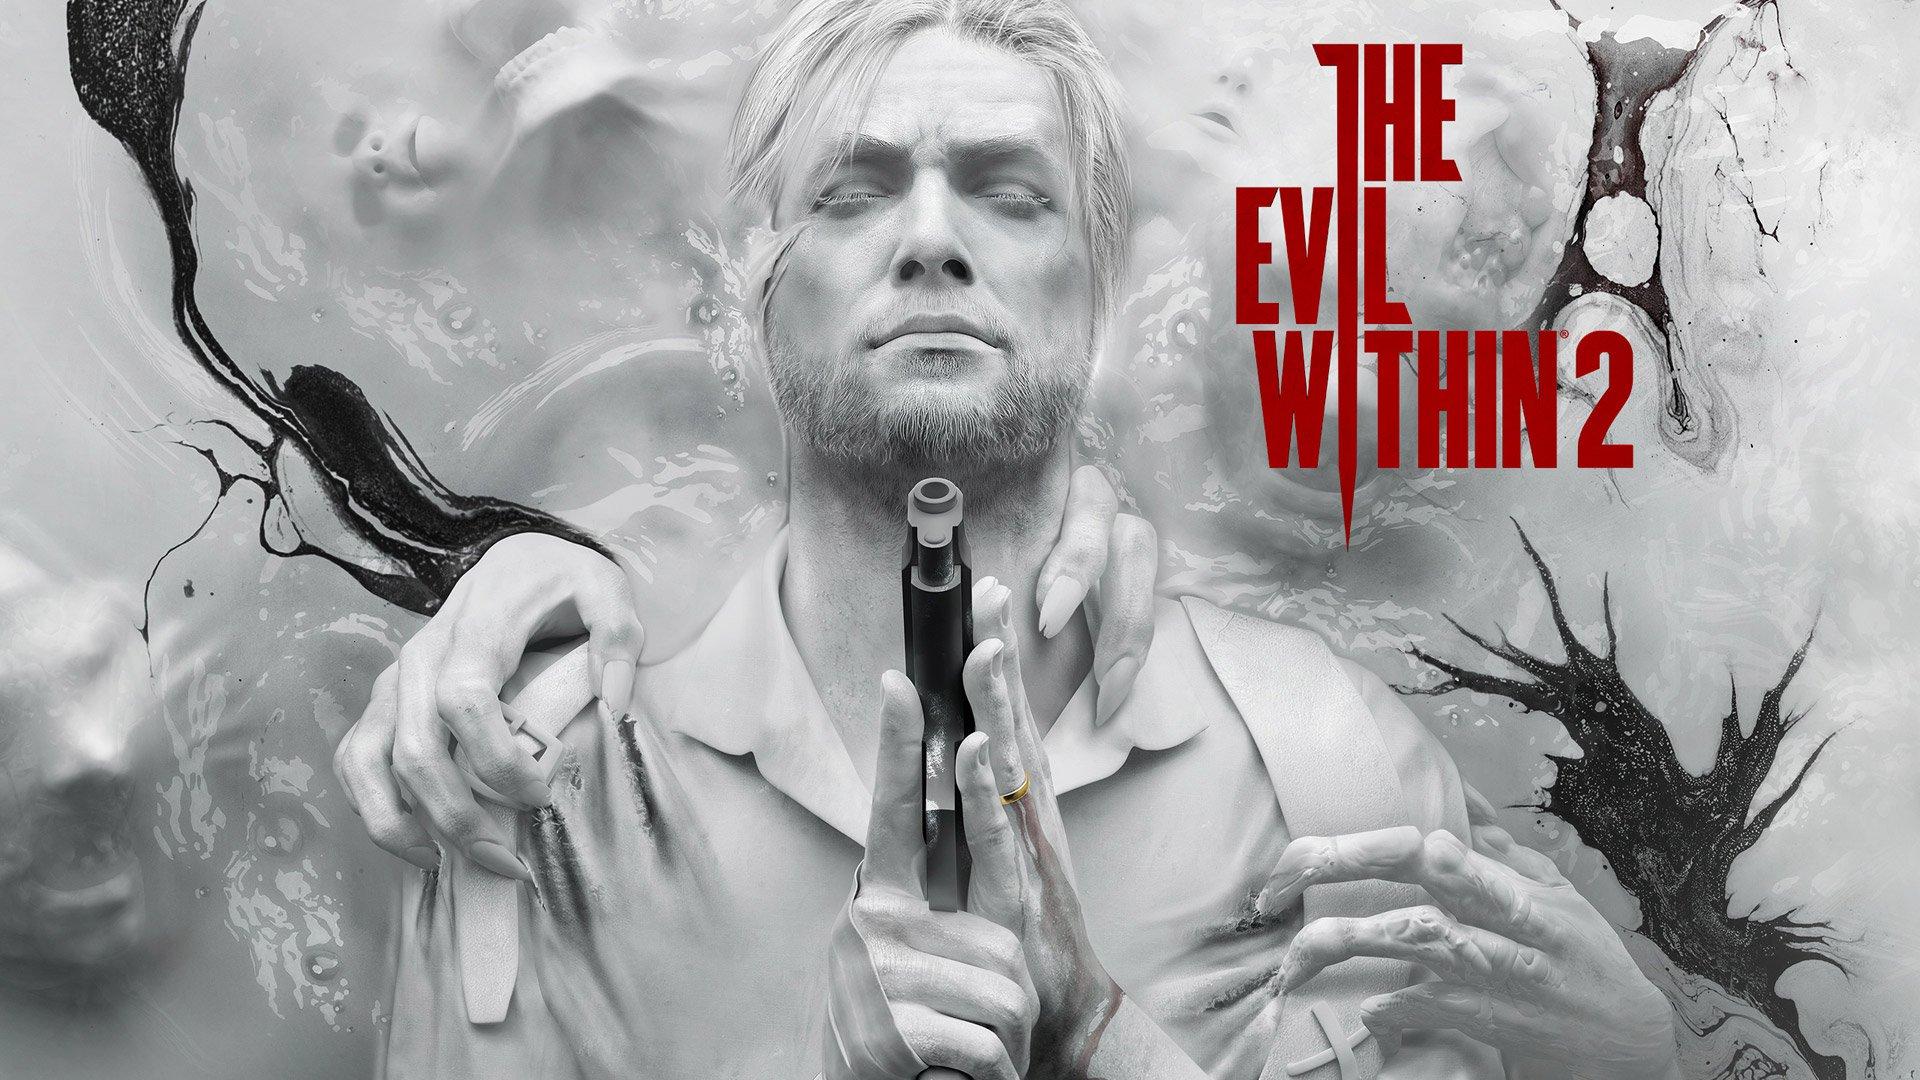 Новый трейлер The Evil Within 2 представил сюжетную завязку хоррора